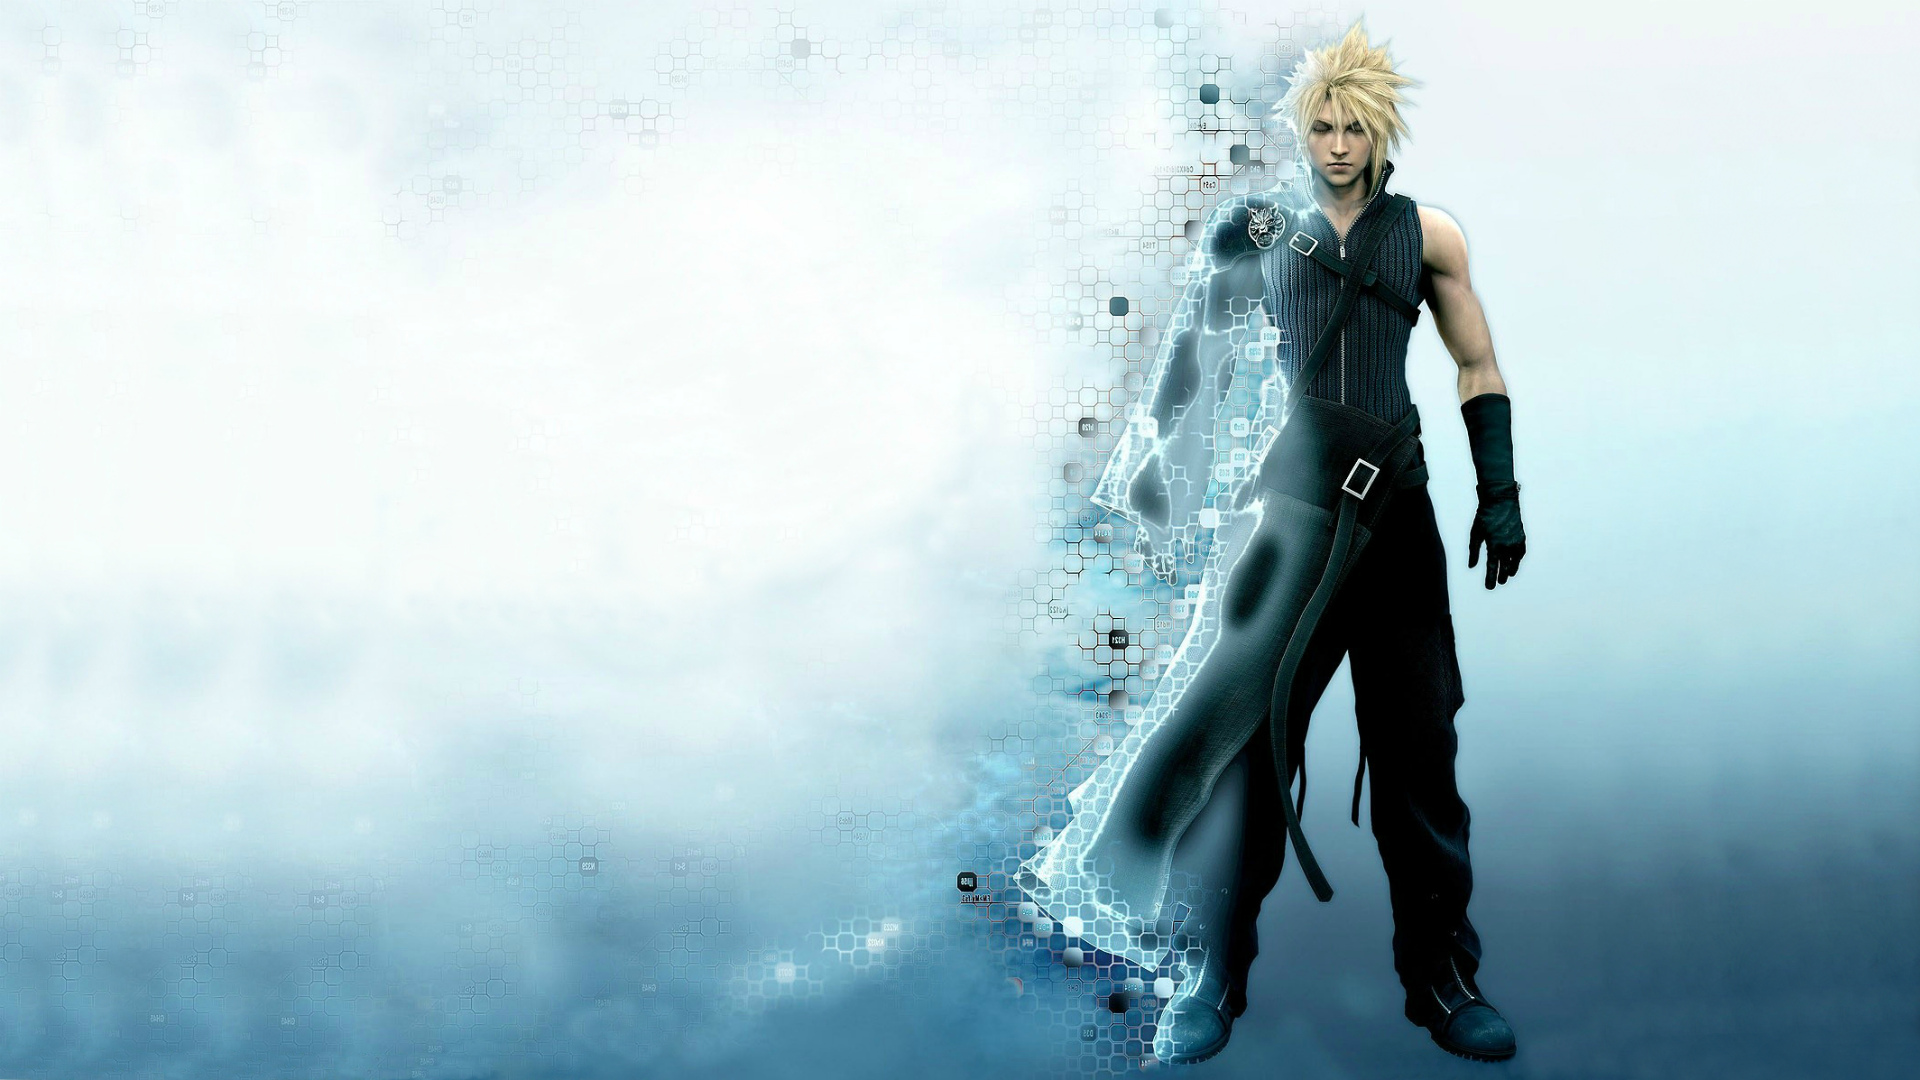 Cloud Final Fantasy Wallpaper Desktop